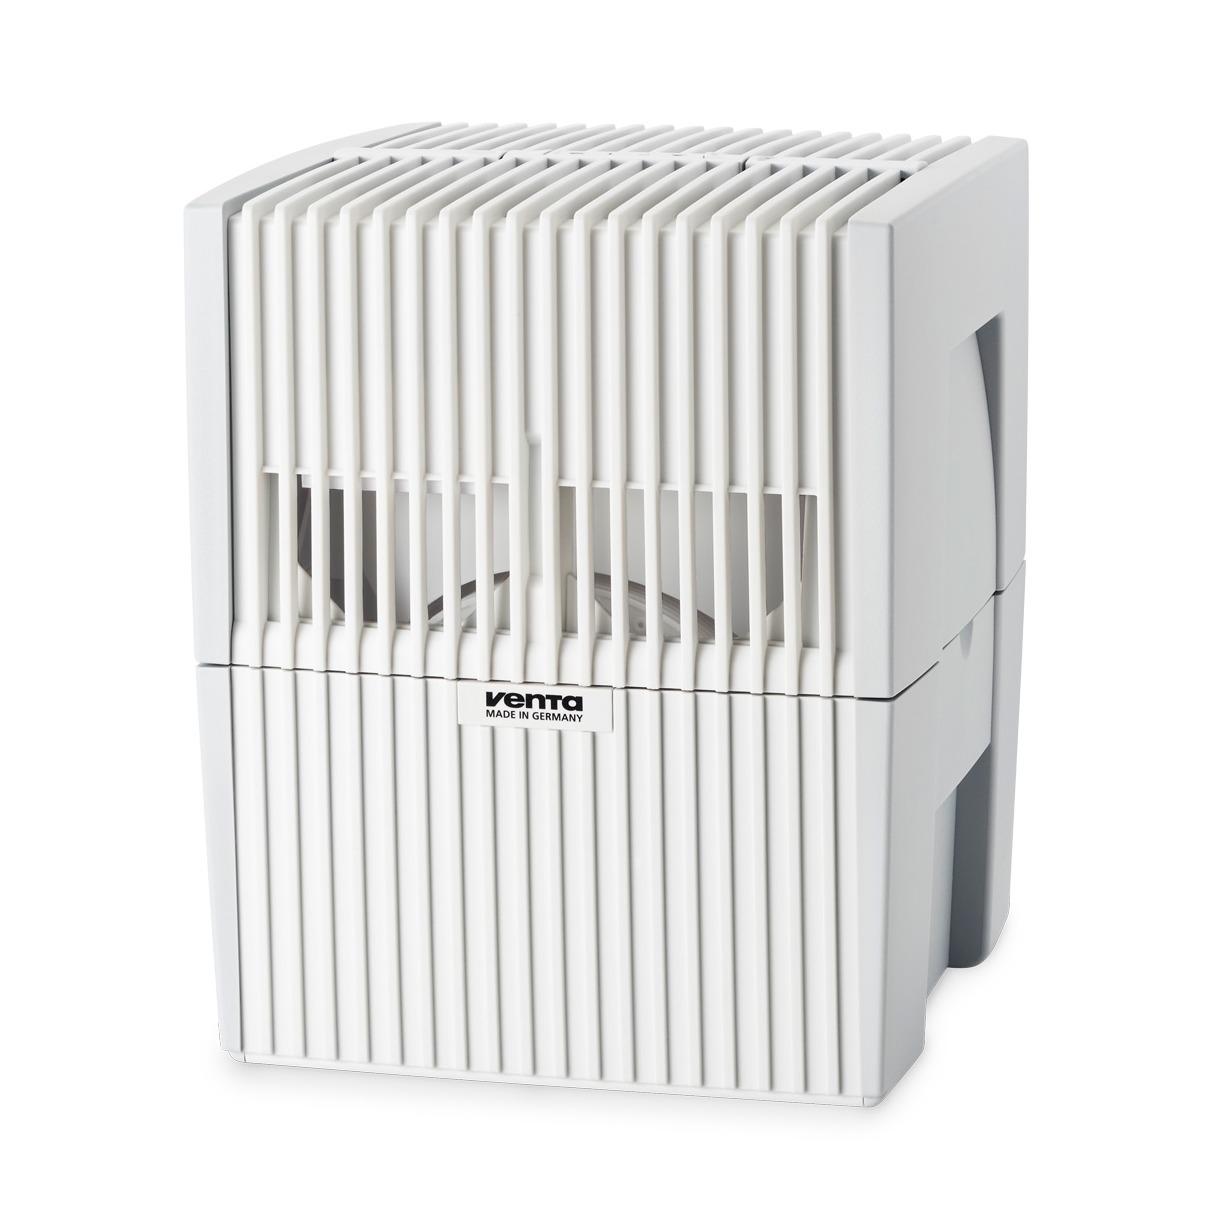 Venta luchtbevochtiger LW15 wit - Prijsvergelijk